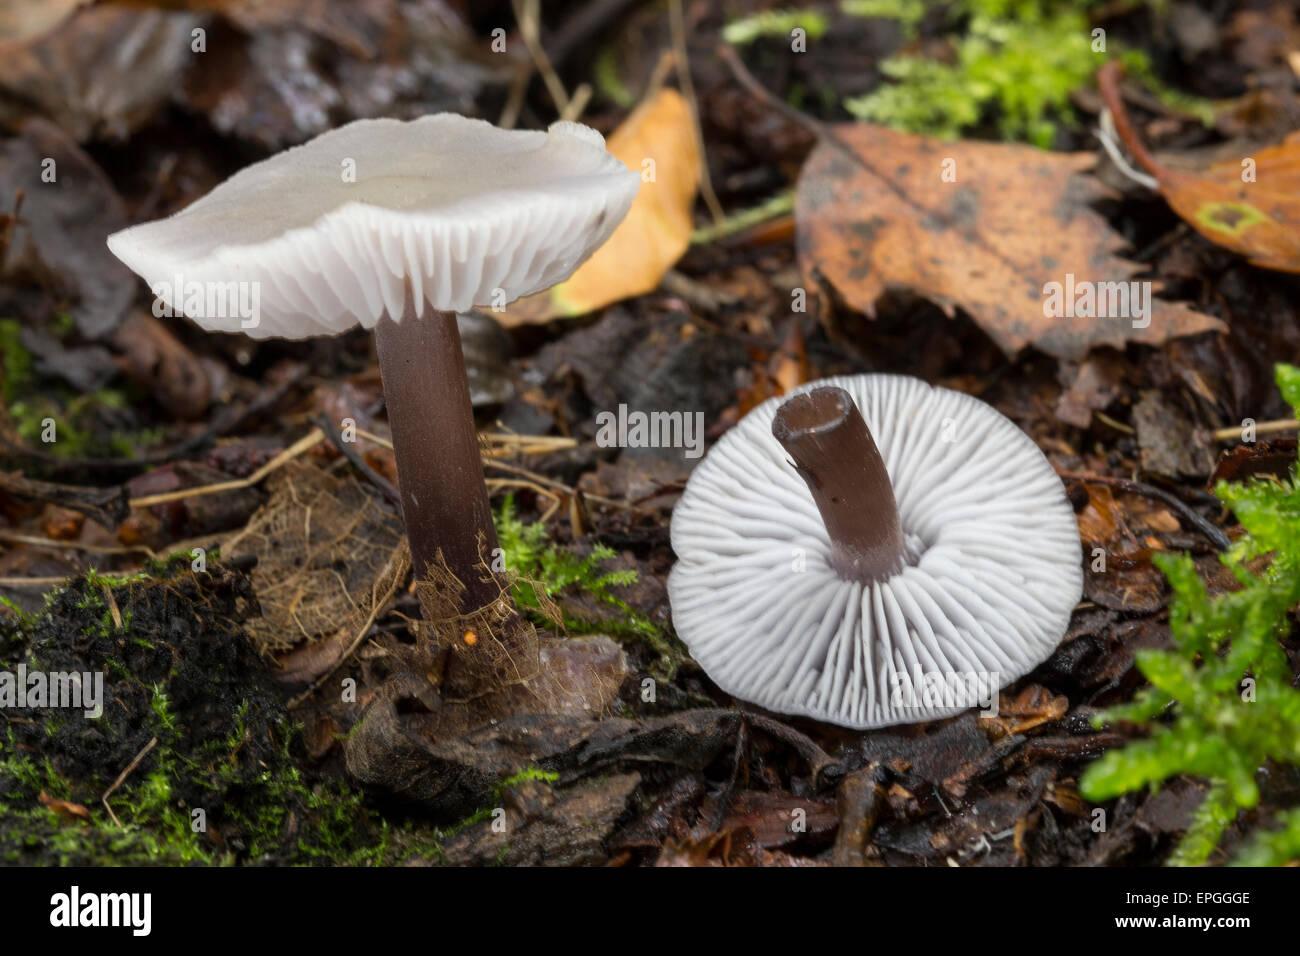 Lilac bonnet, Gemeiner Rettich-Helmling, Lila Rettichhelmling, Helmling, Mycena pura, Prunulus purum - Stock Image